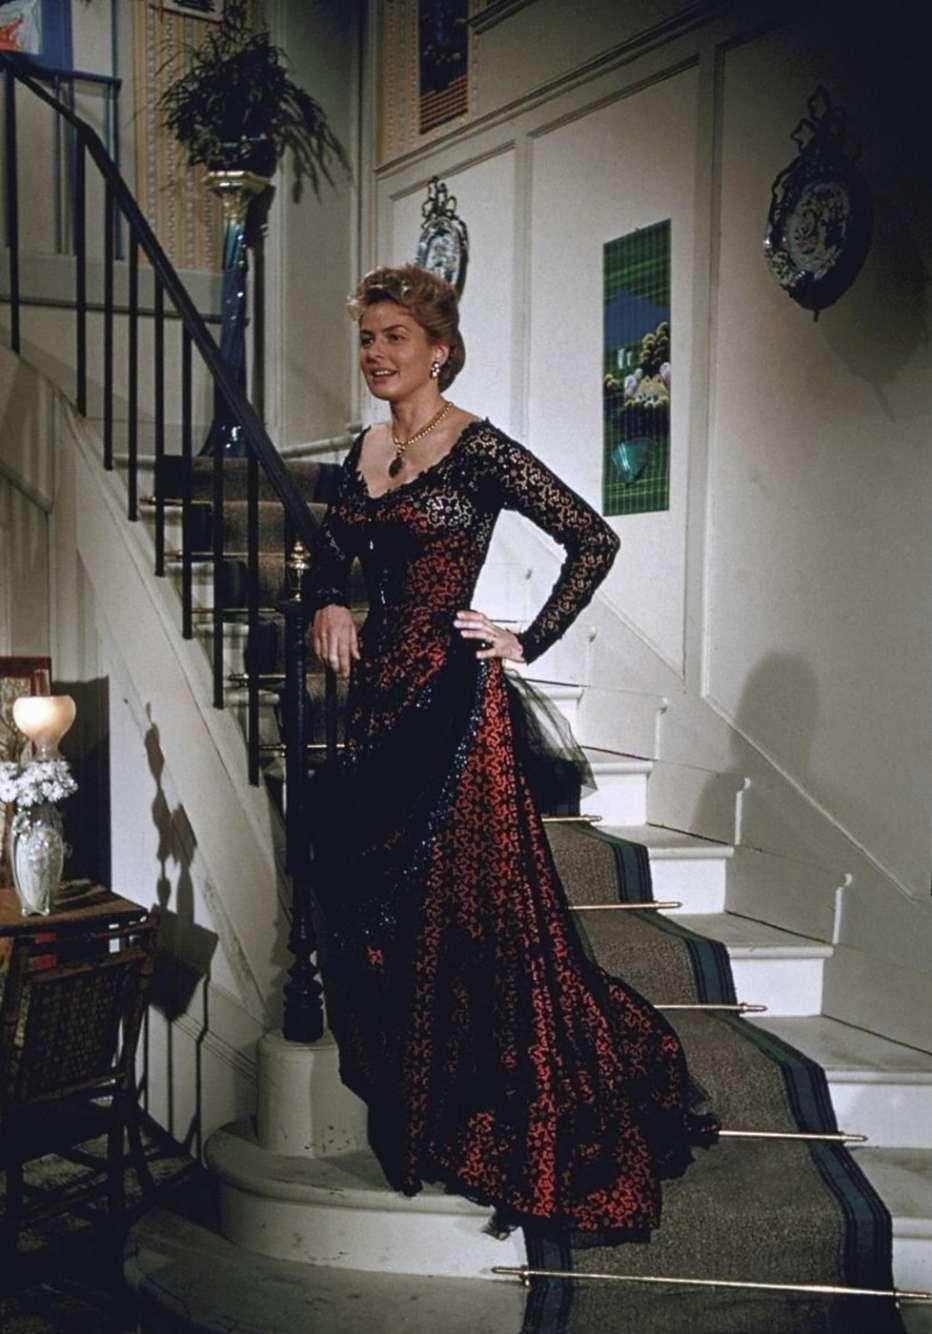 Eliana-e-gli-uomini-1956-Jean-Renoir-001.jpg